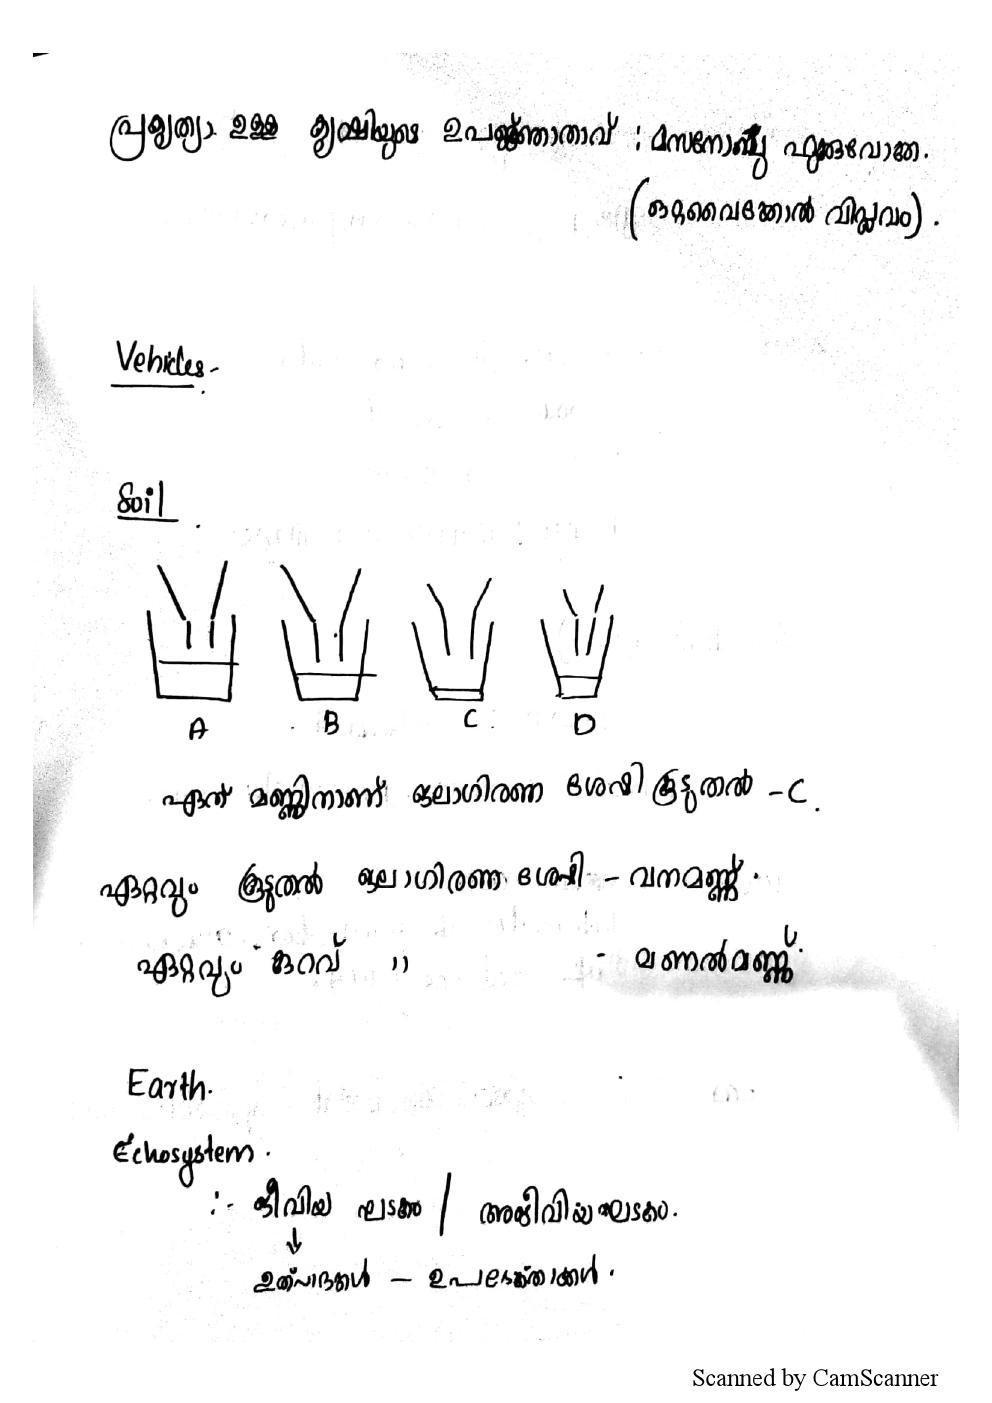 http://masterstudy.net/pdf/ktet_notes0036.png